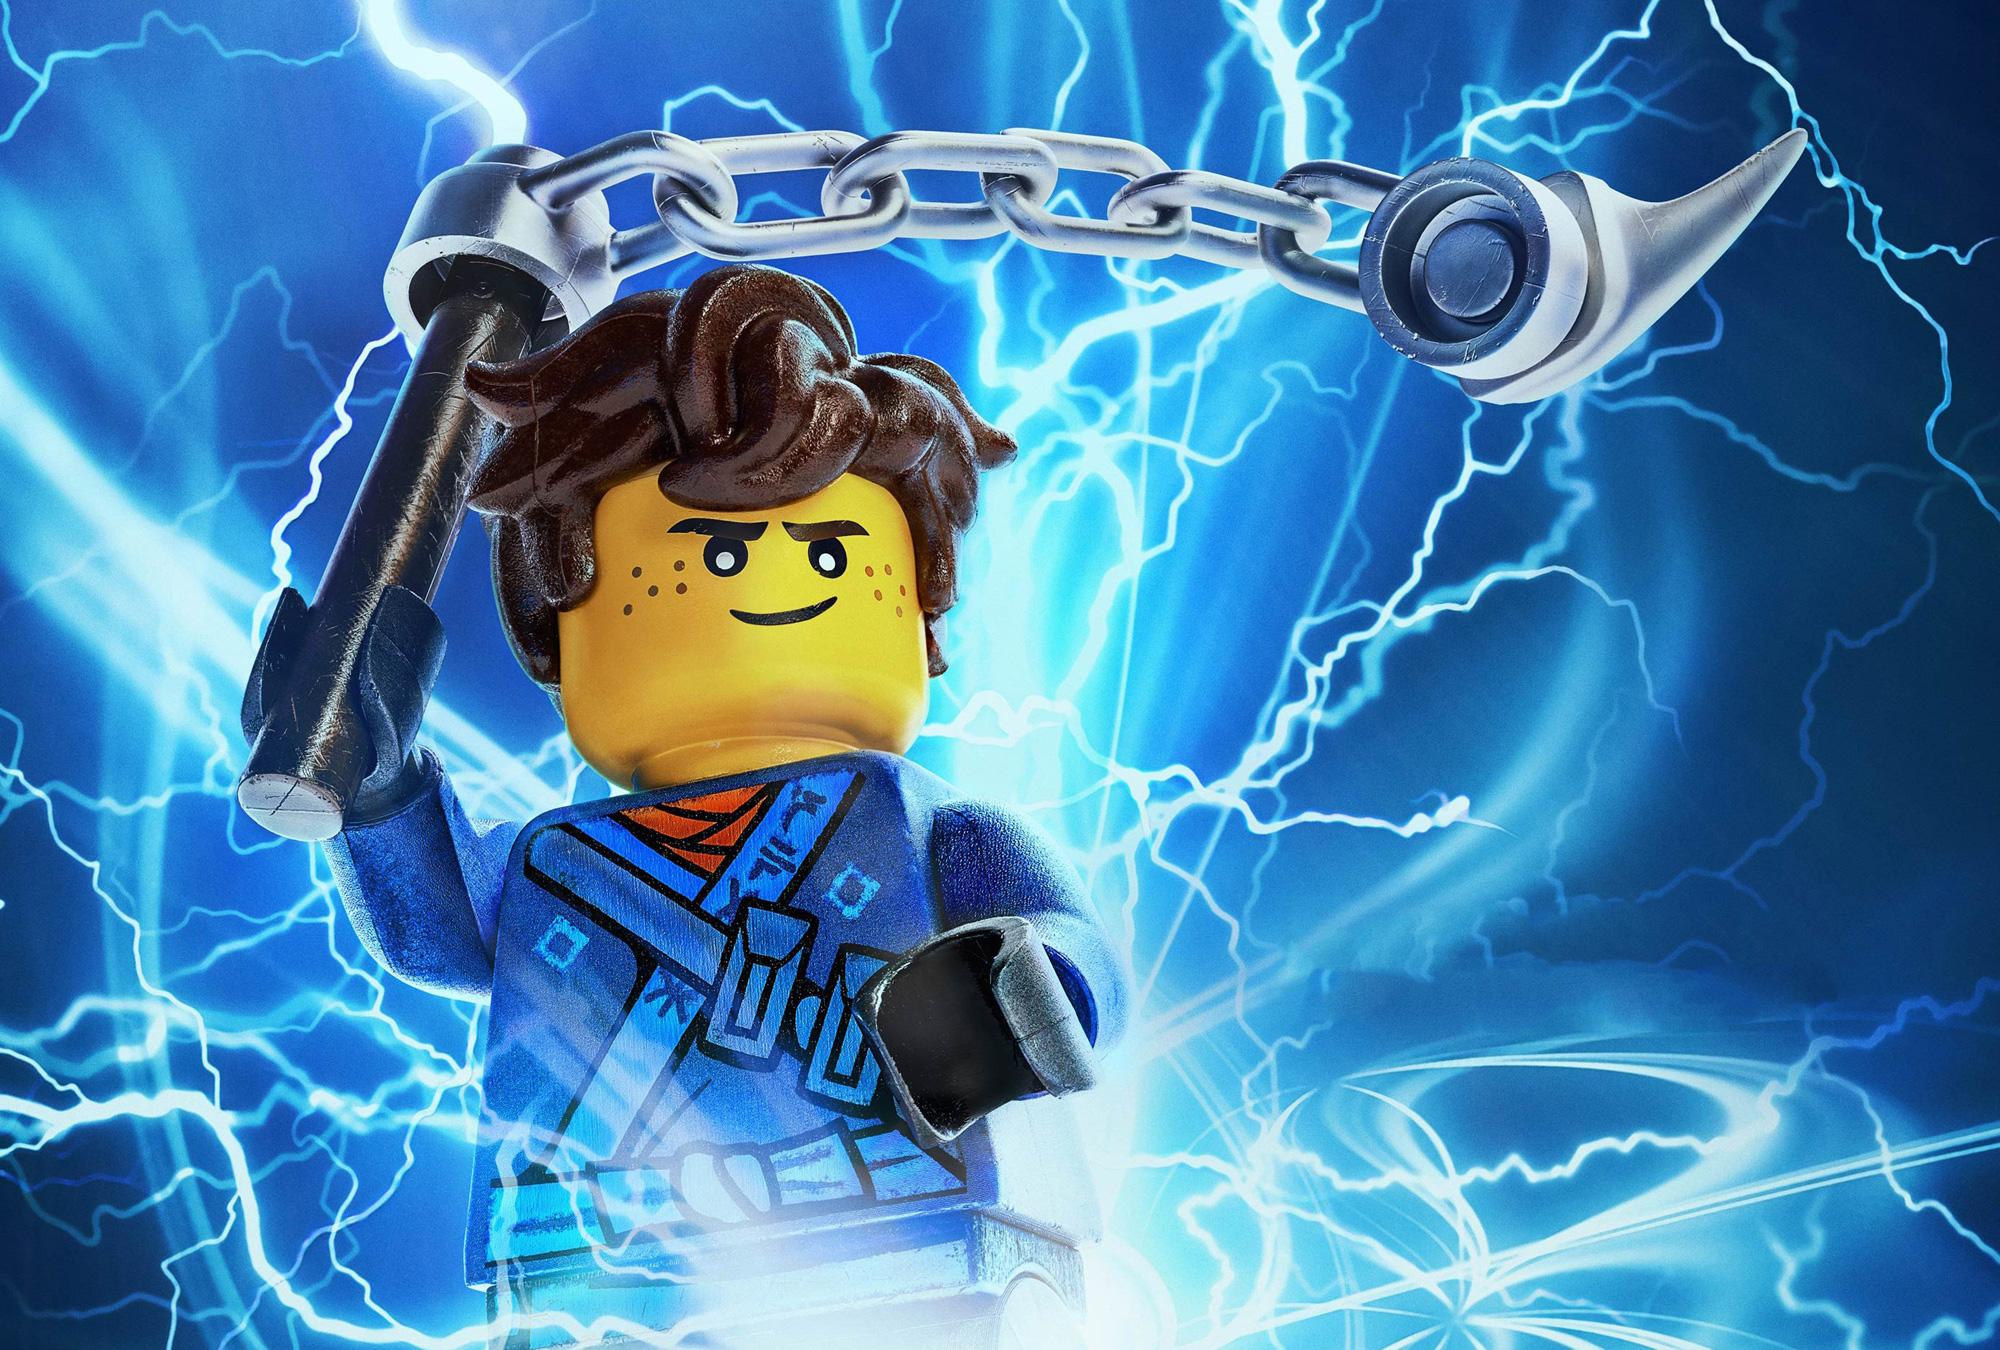 Fondos Para Pantalla: Fondos De Pantalla La Lego Ninjago, Wallpapers HD